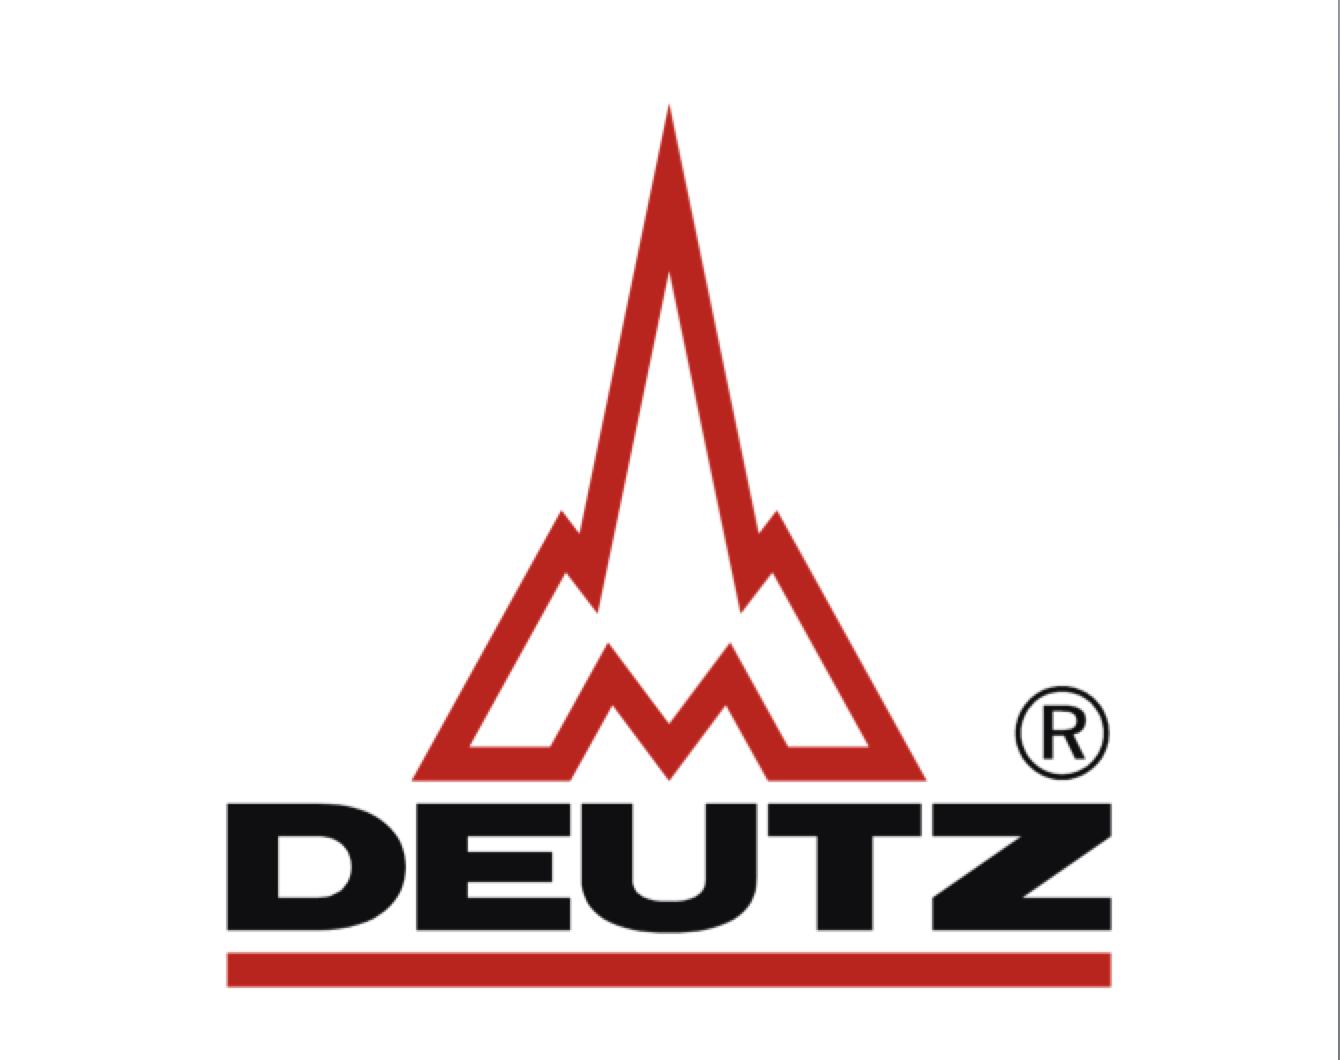 deutz-engine-parts-zodiac-trading-dubai2